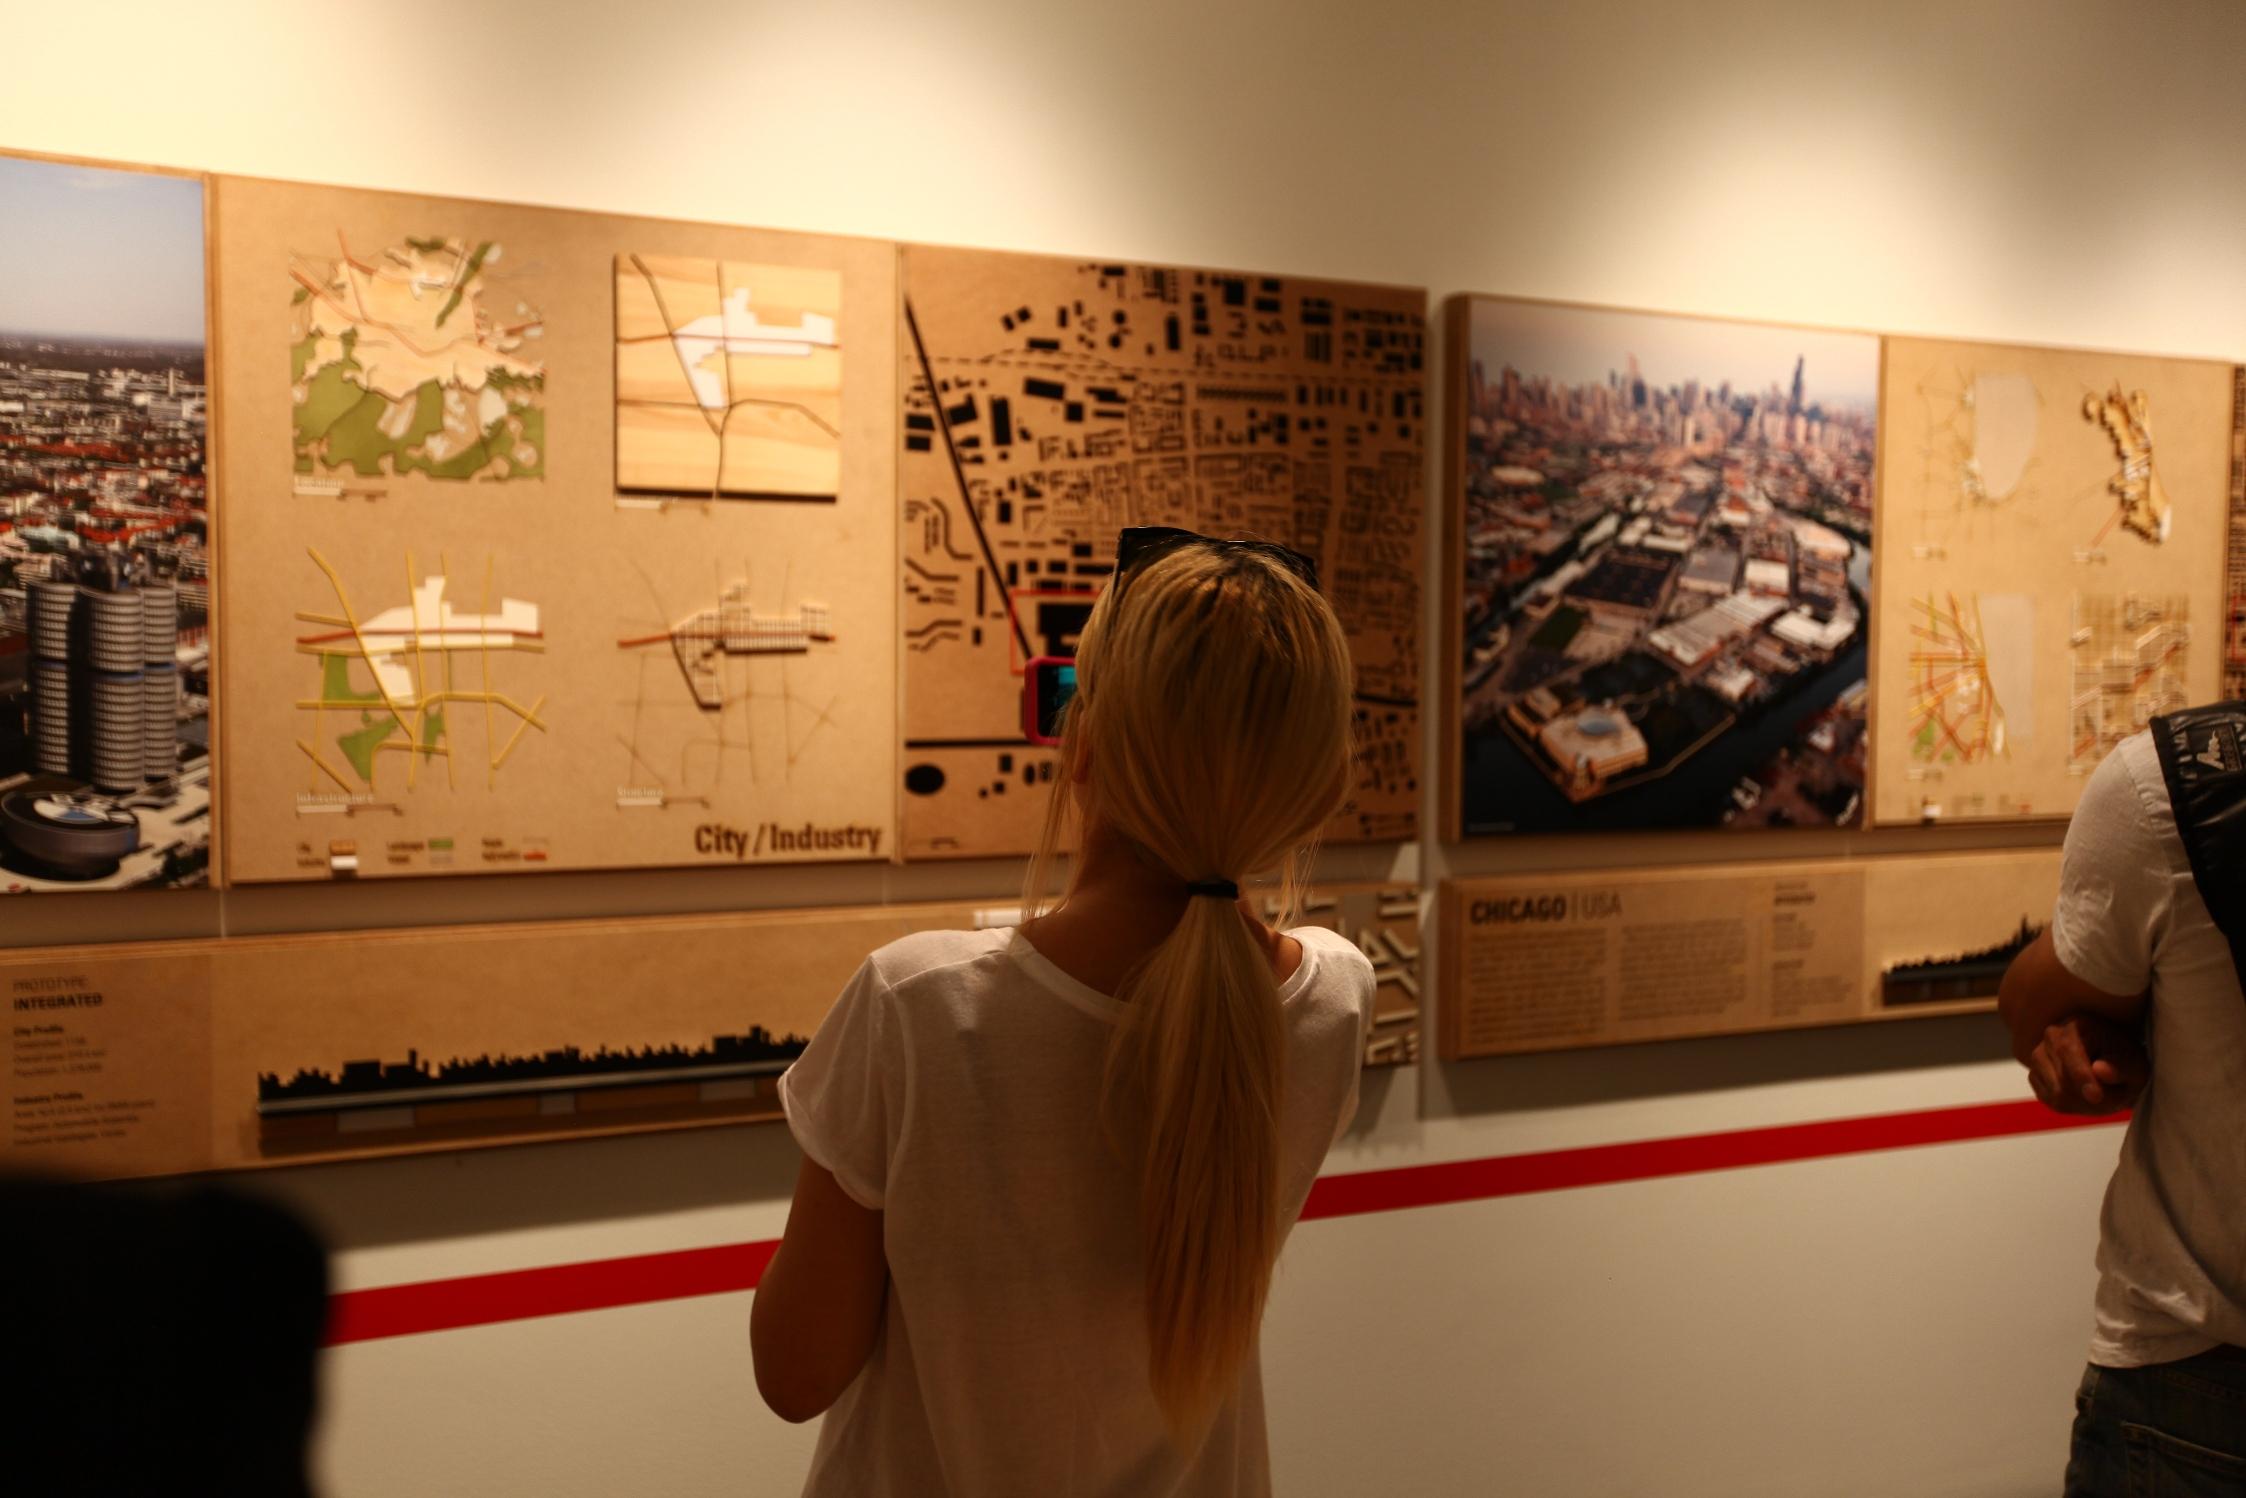 Industrial Urbanism 13